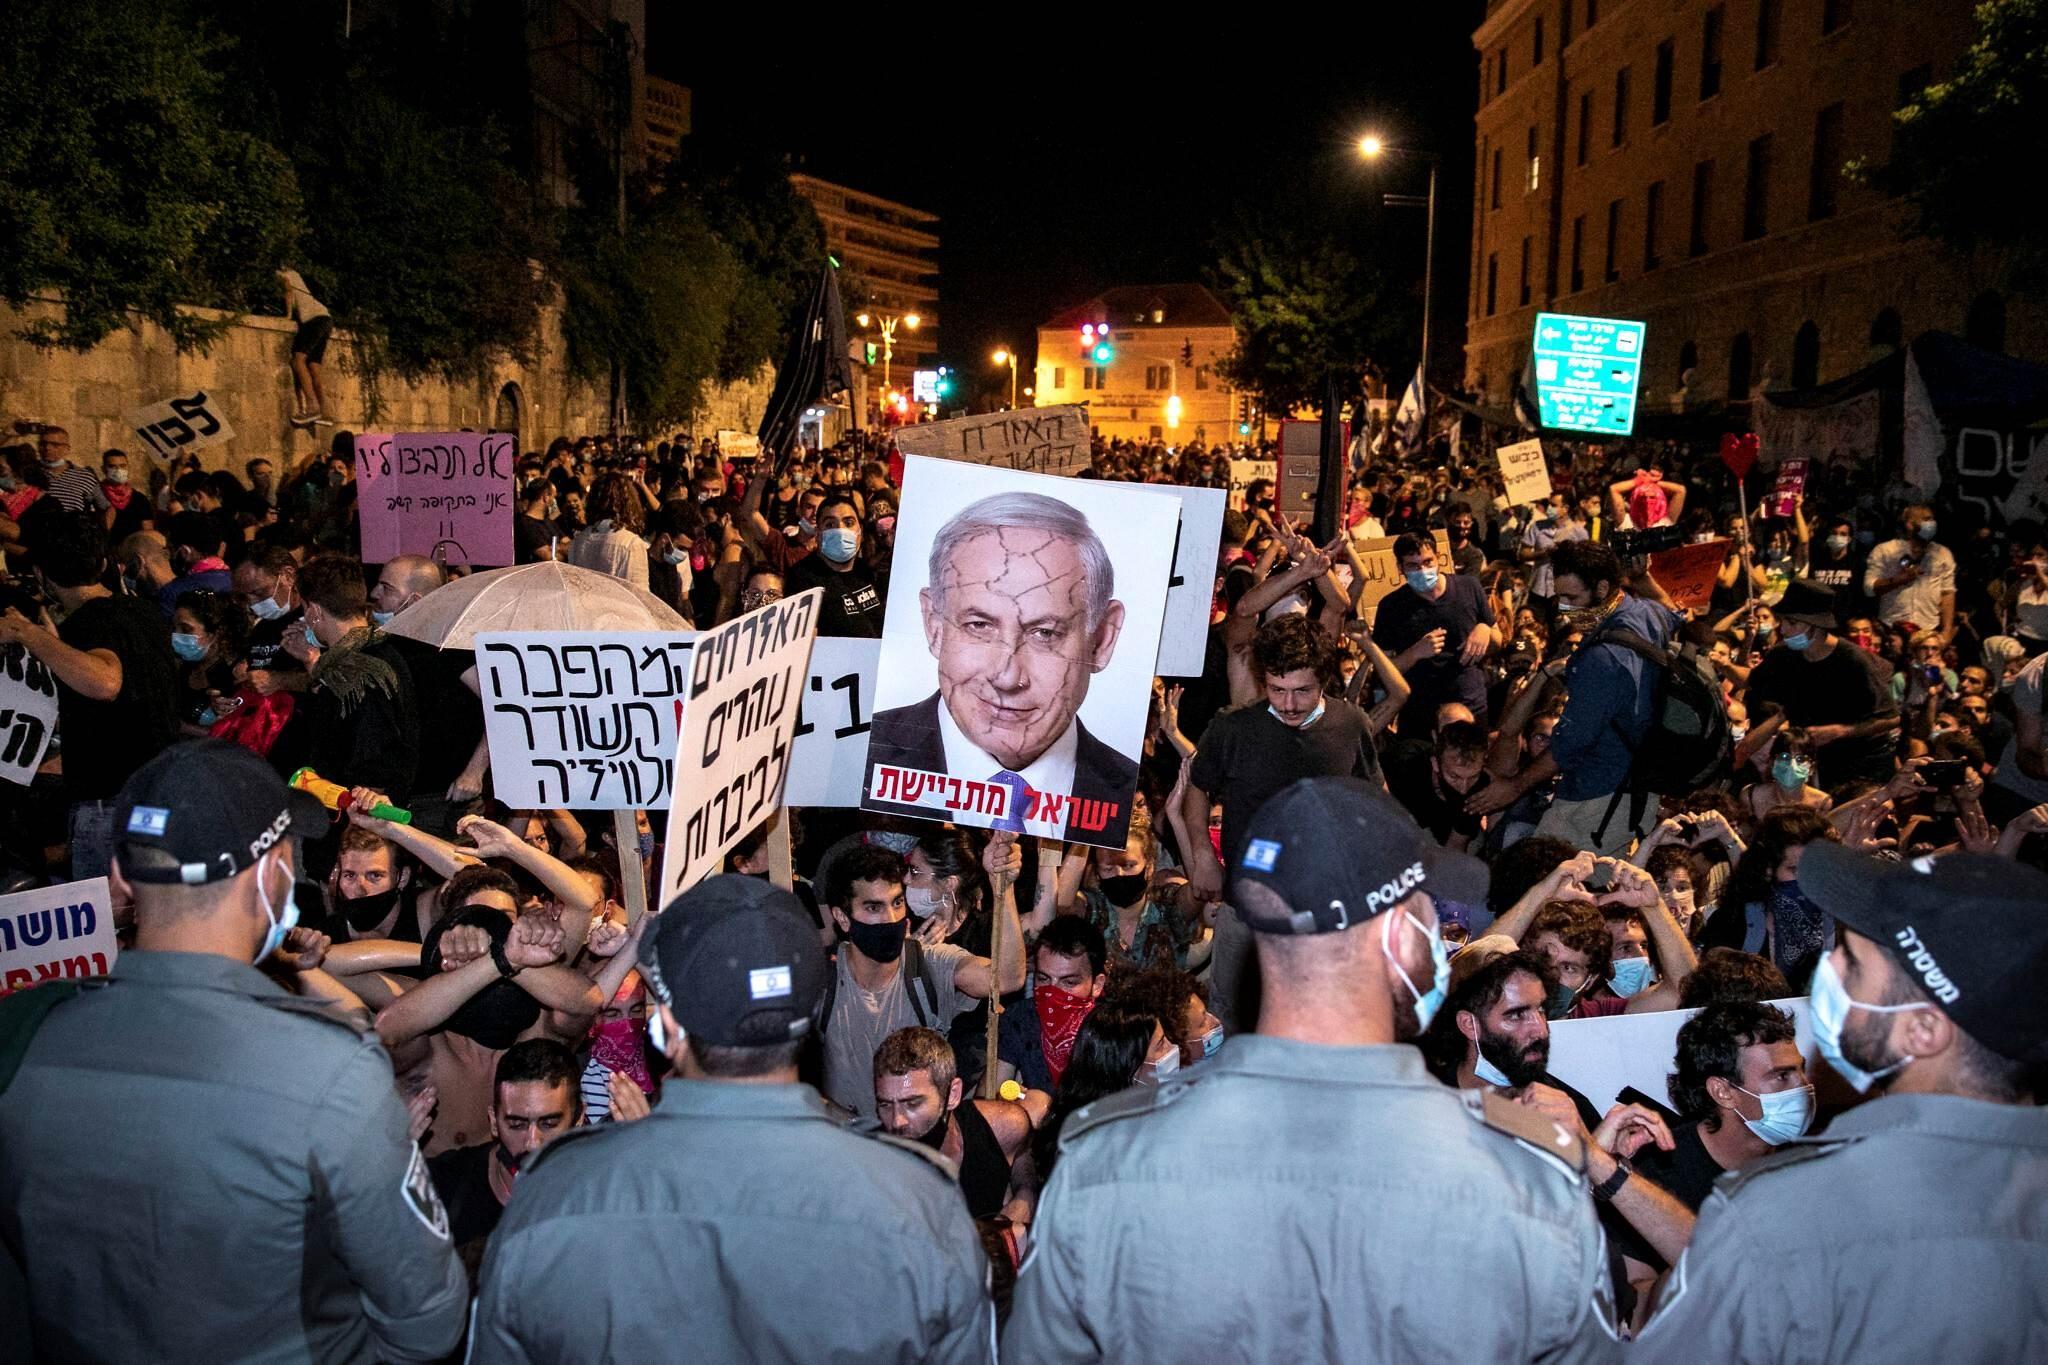 تظاهرات تطالب برحيل نتنياهو.